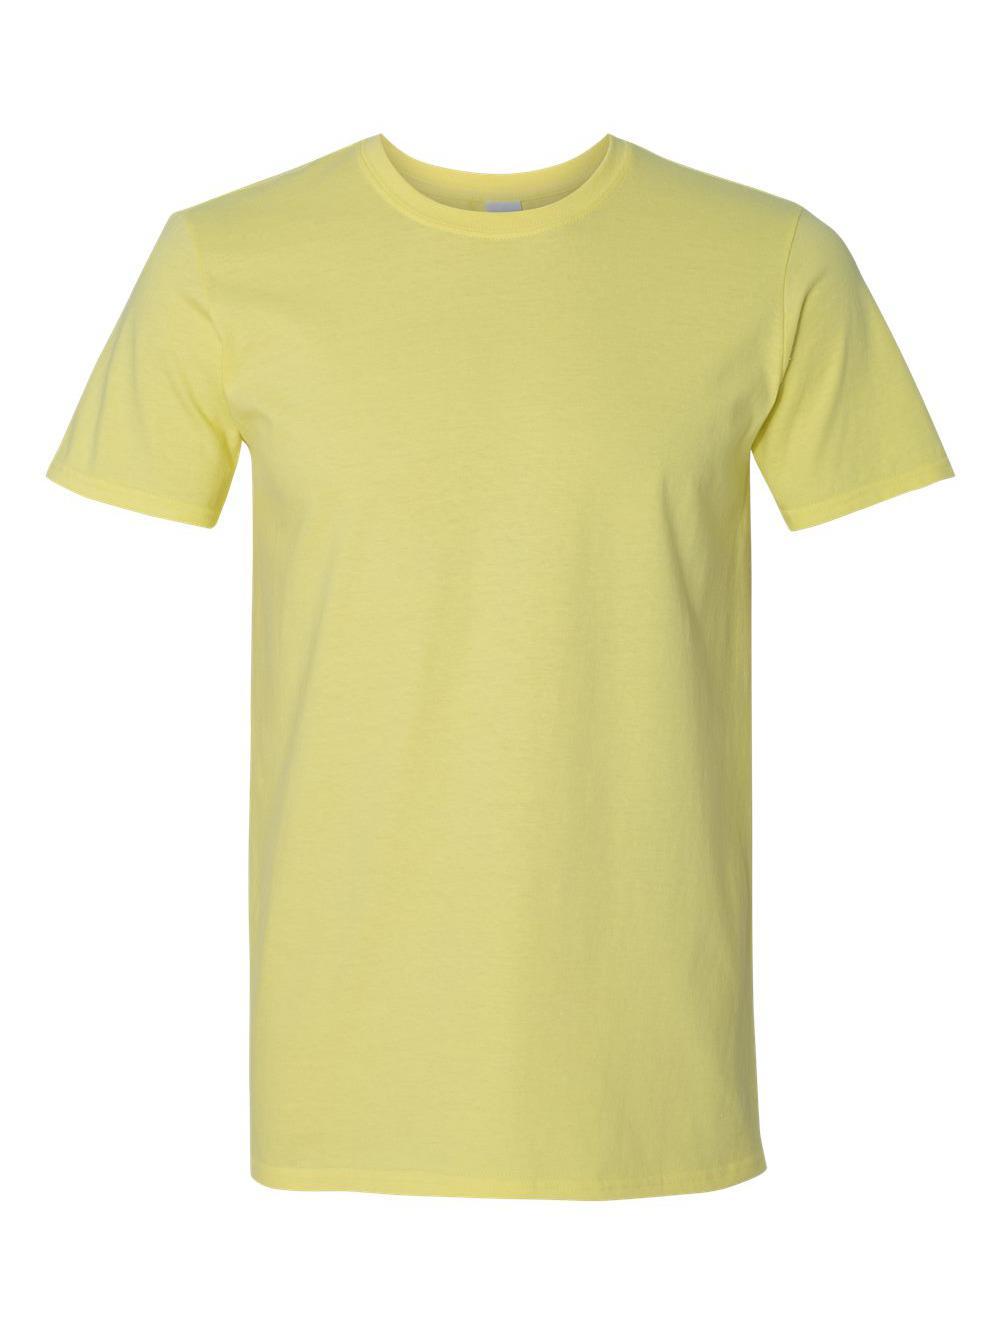 Gildan-Softstyle-T-Shirt-64000 thumbnail 39